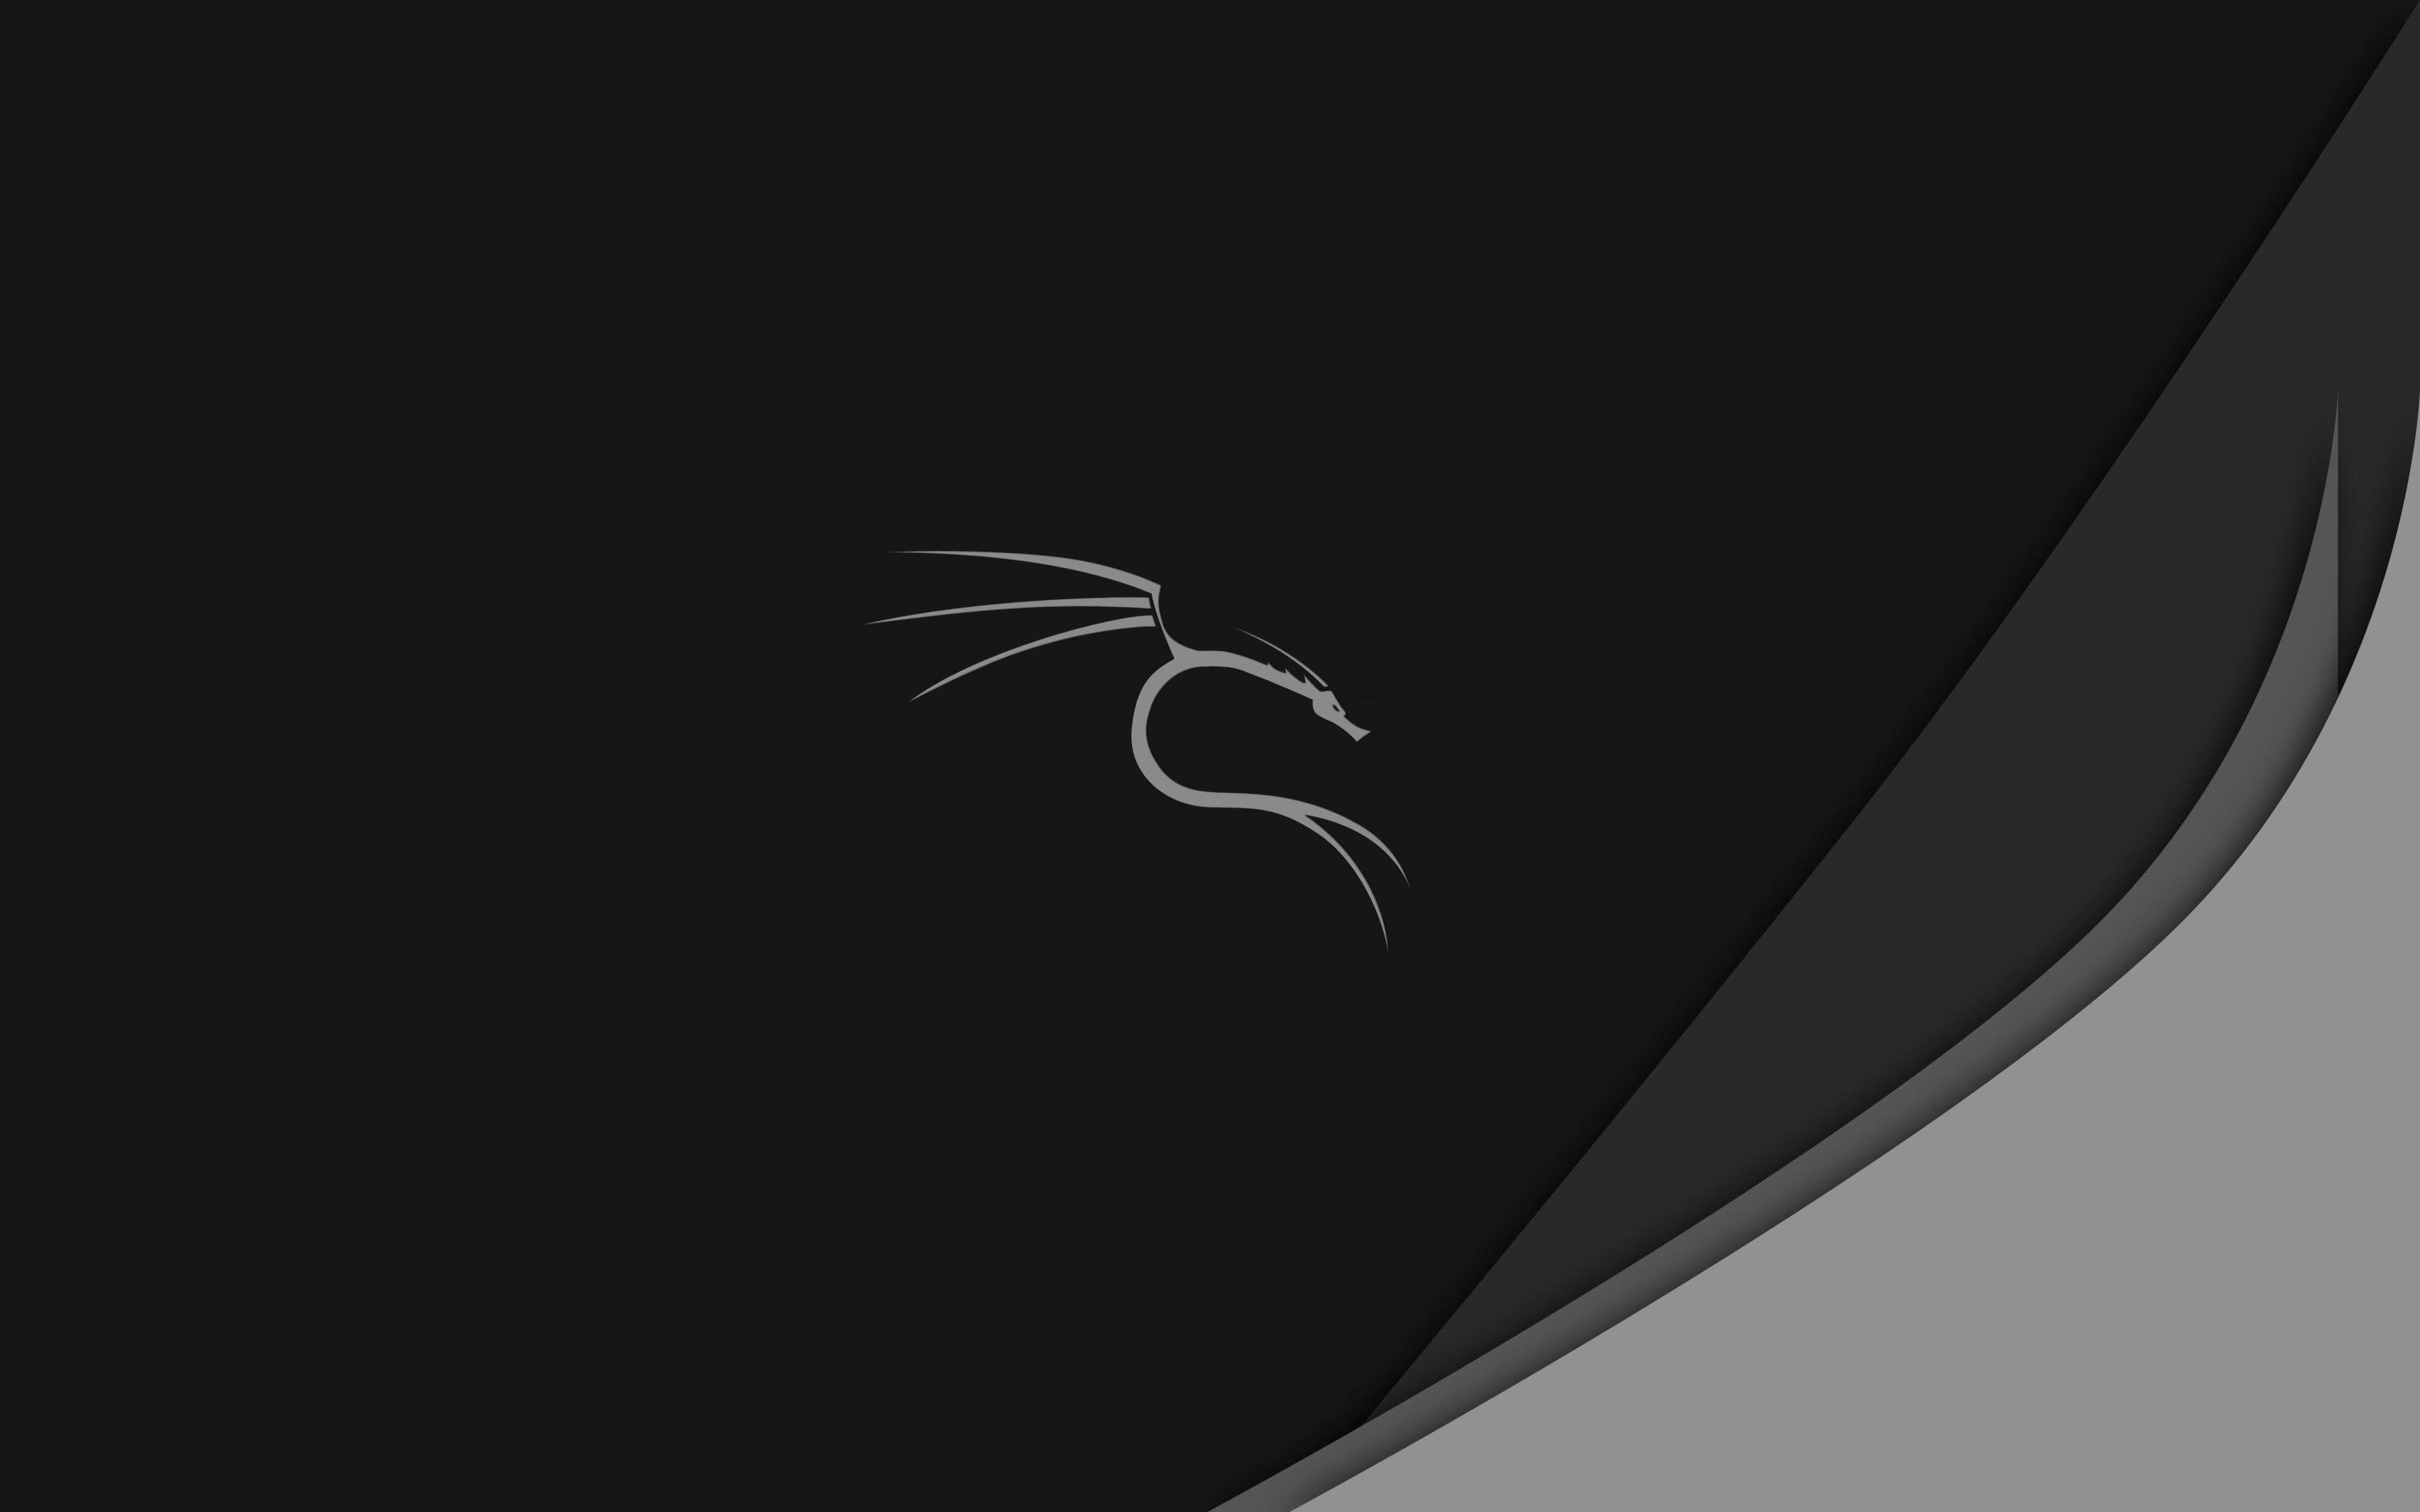 Github Dorianpro Kali Linux Wallpapers A Set Of Dedicated